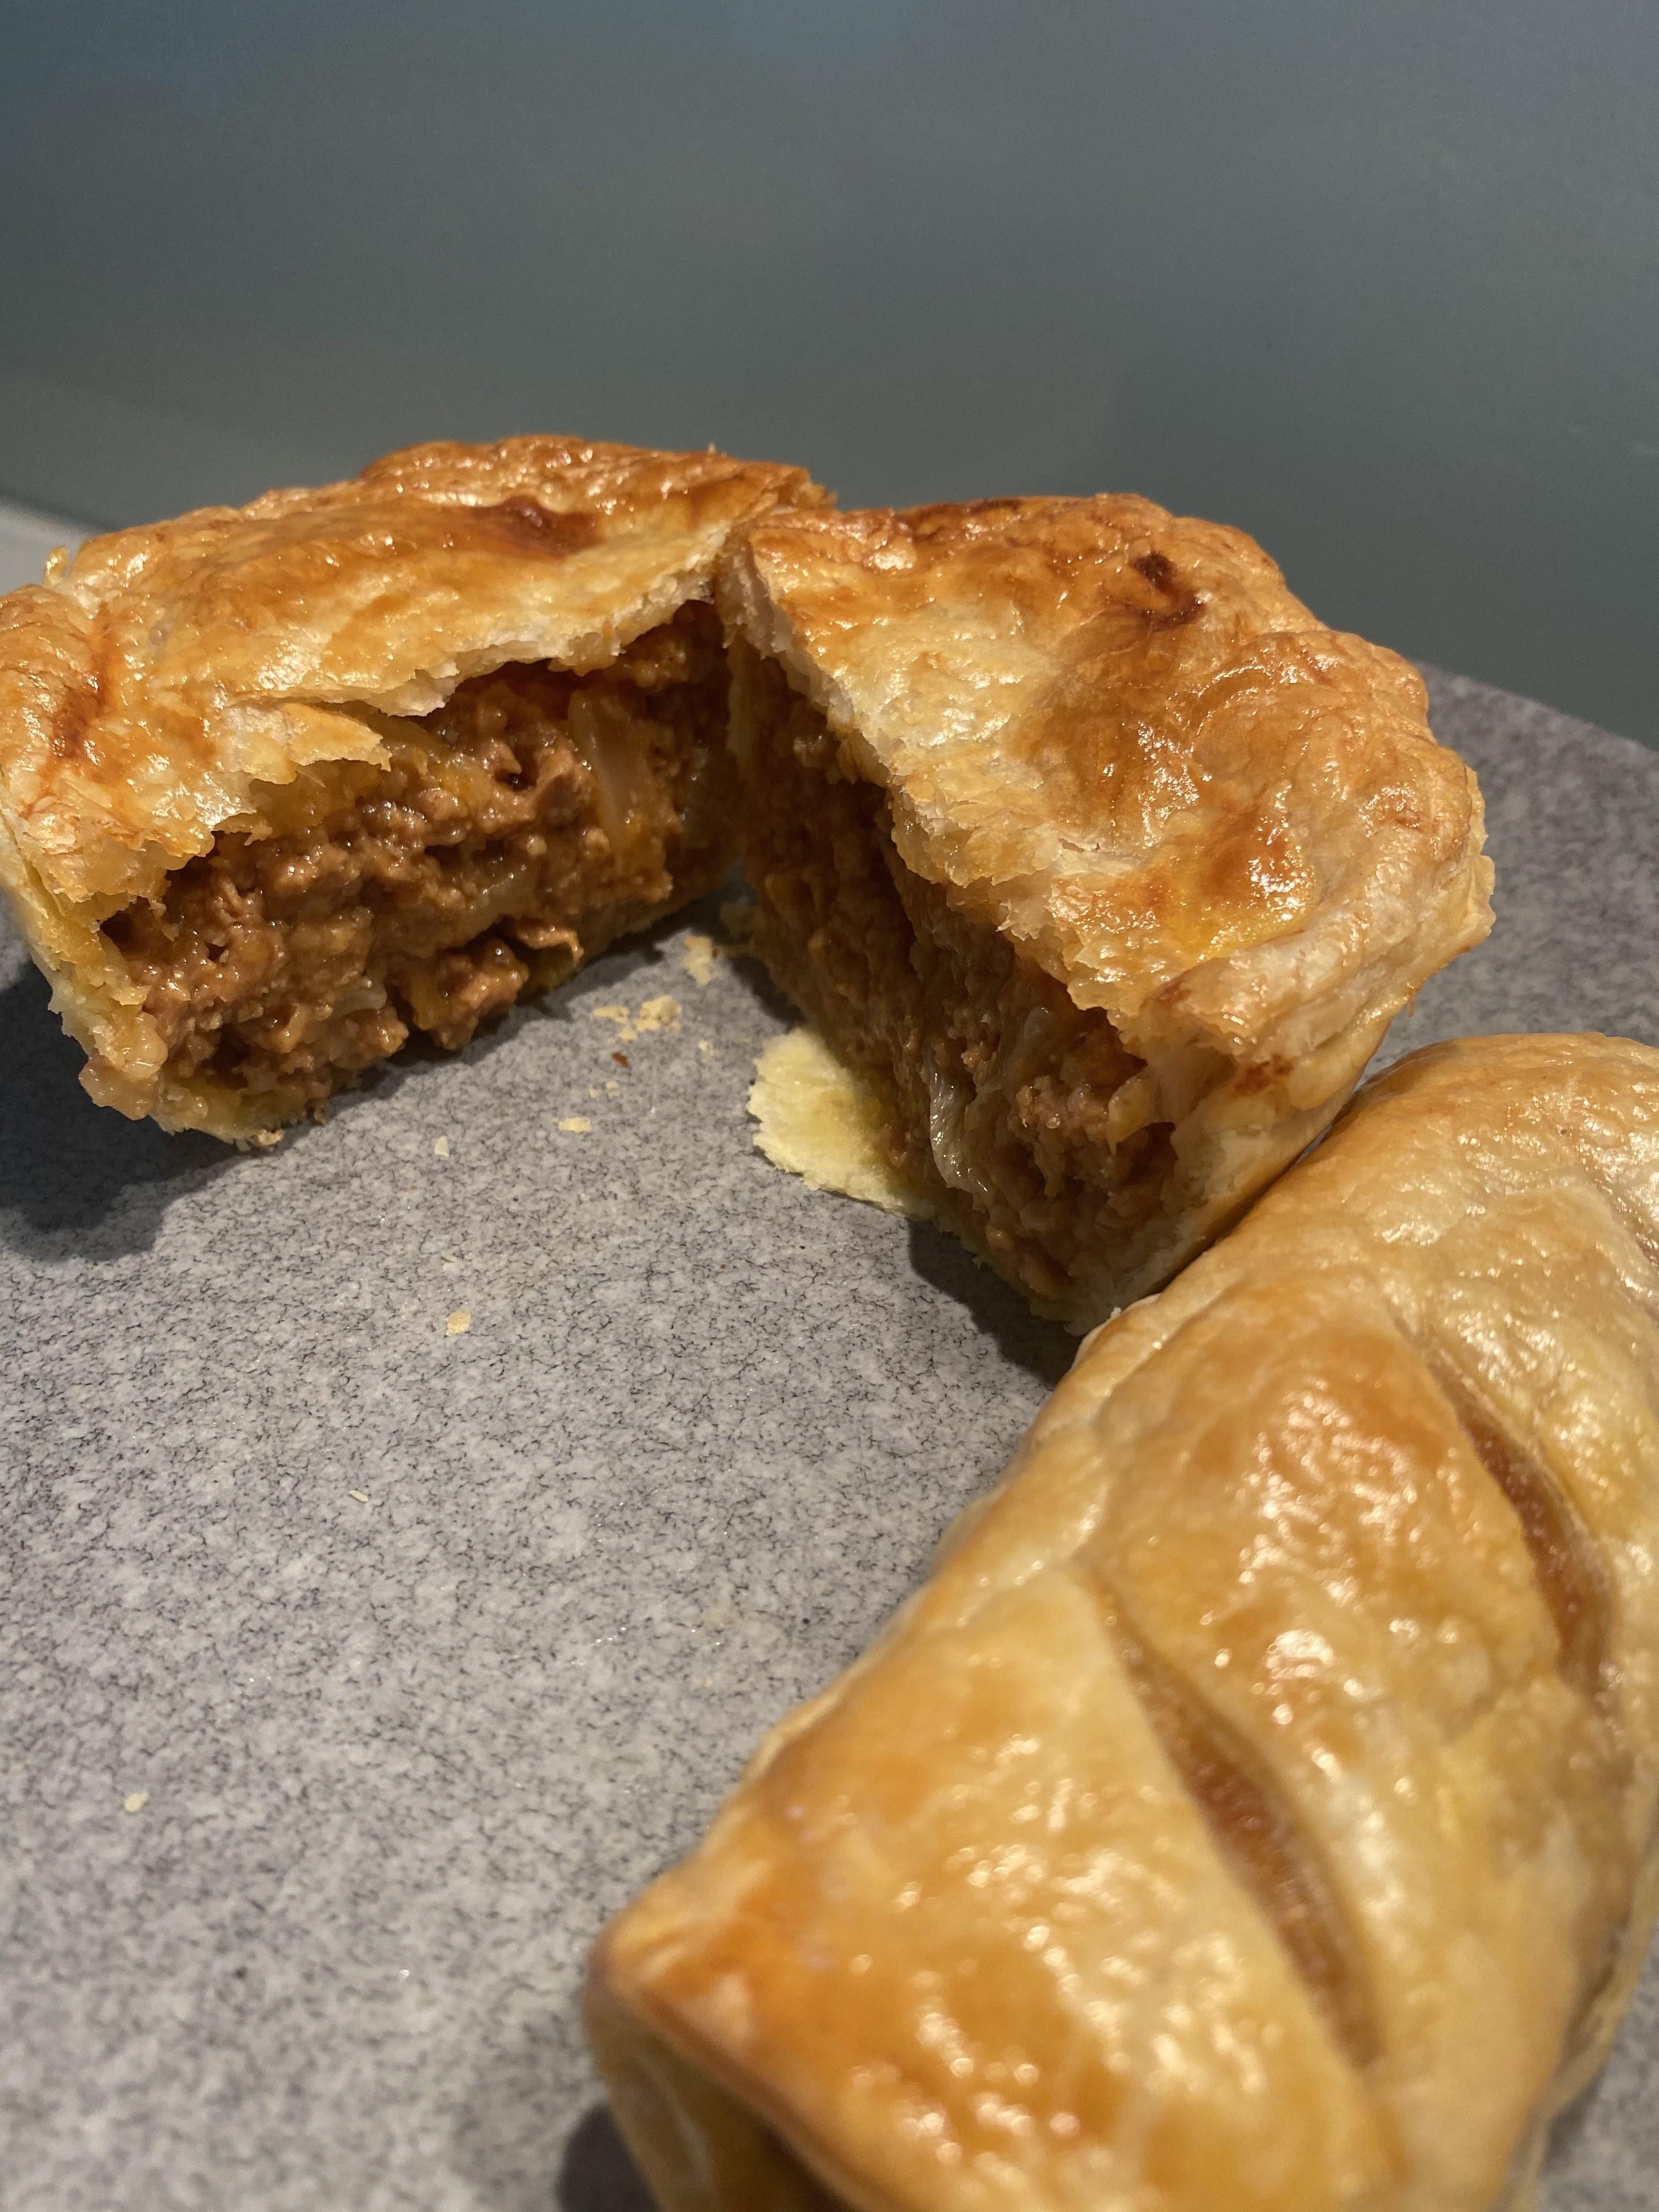 Pie cut open showing the plant-based meat inside